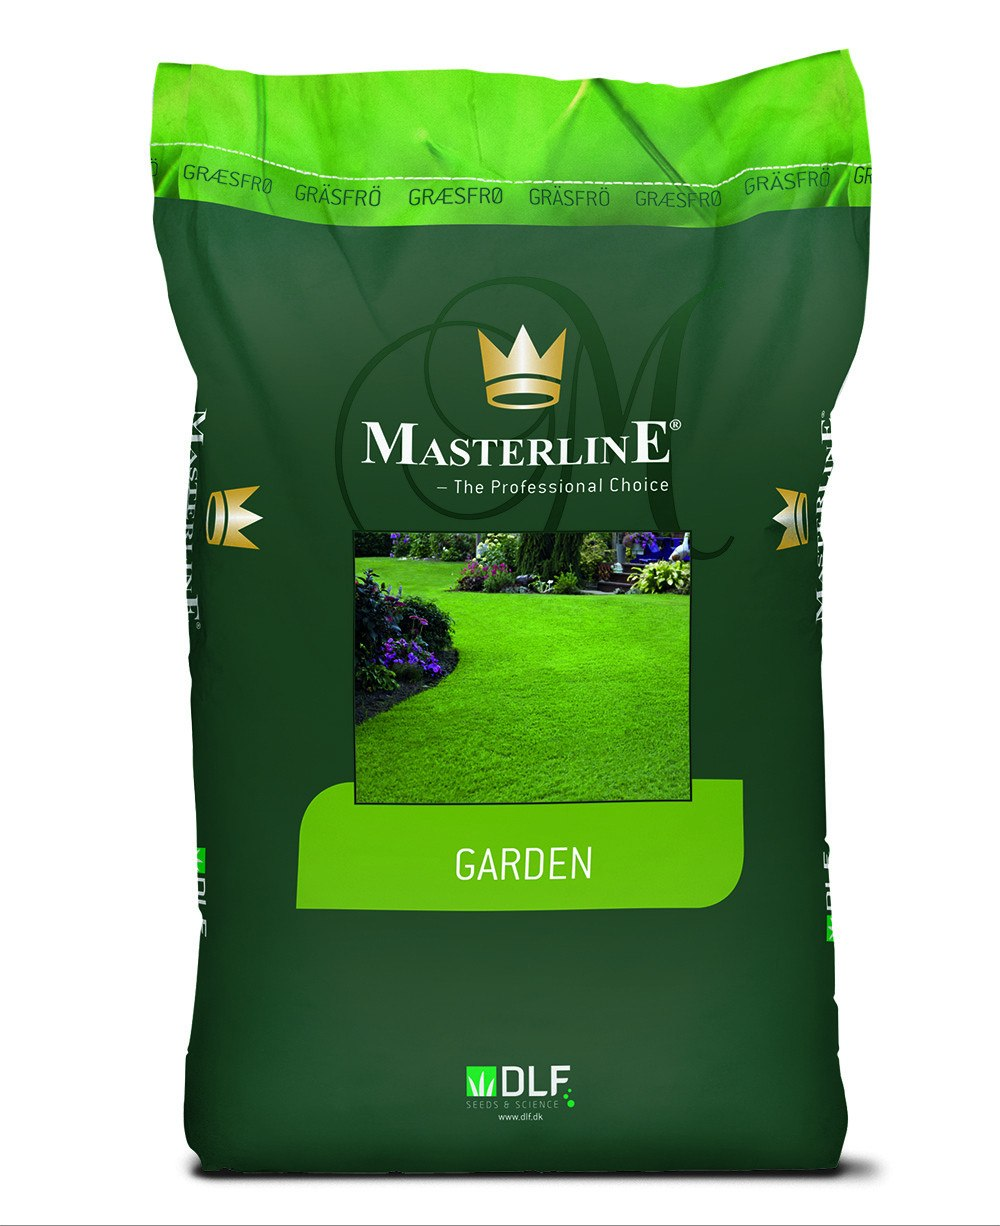 Masterline Micro - græsfrø med Microkløver - 15 kg. / 600 m2